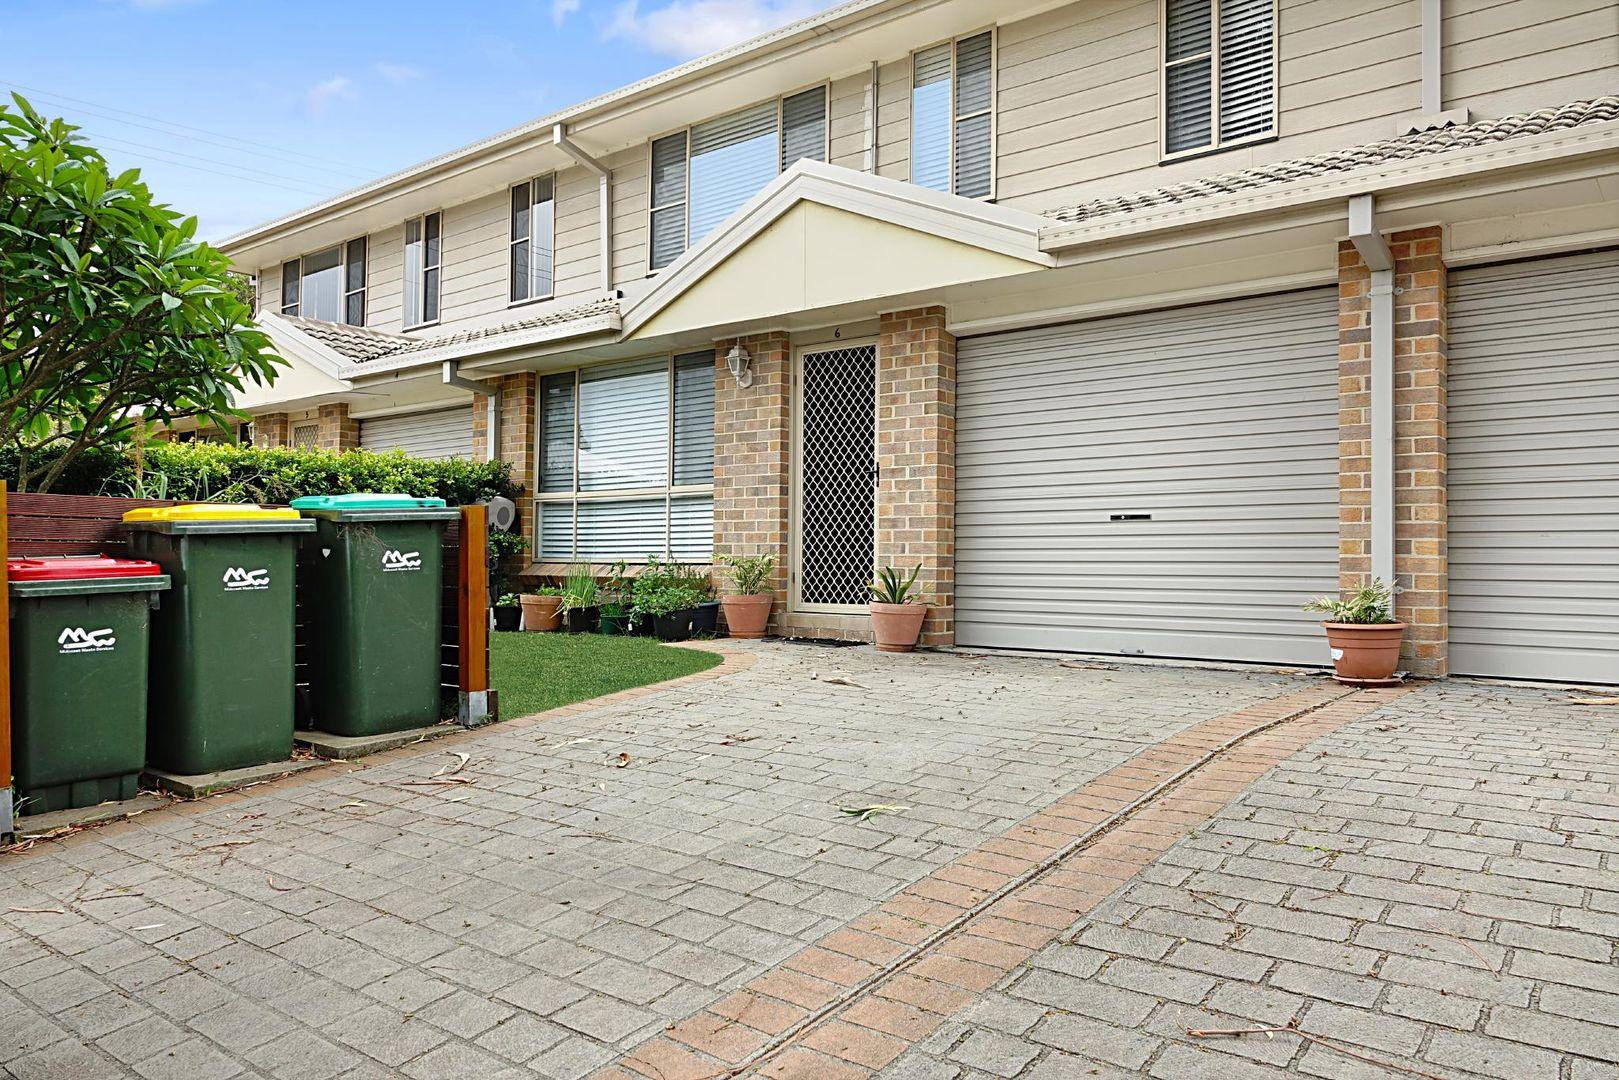 6/38-42 Booner Street, Hawks Nest NSW 2324, Image 0